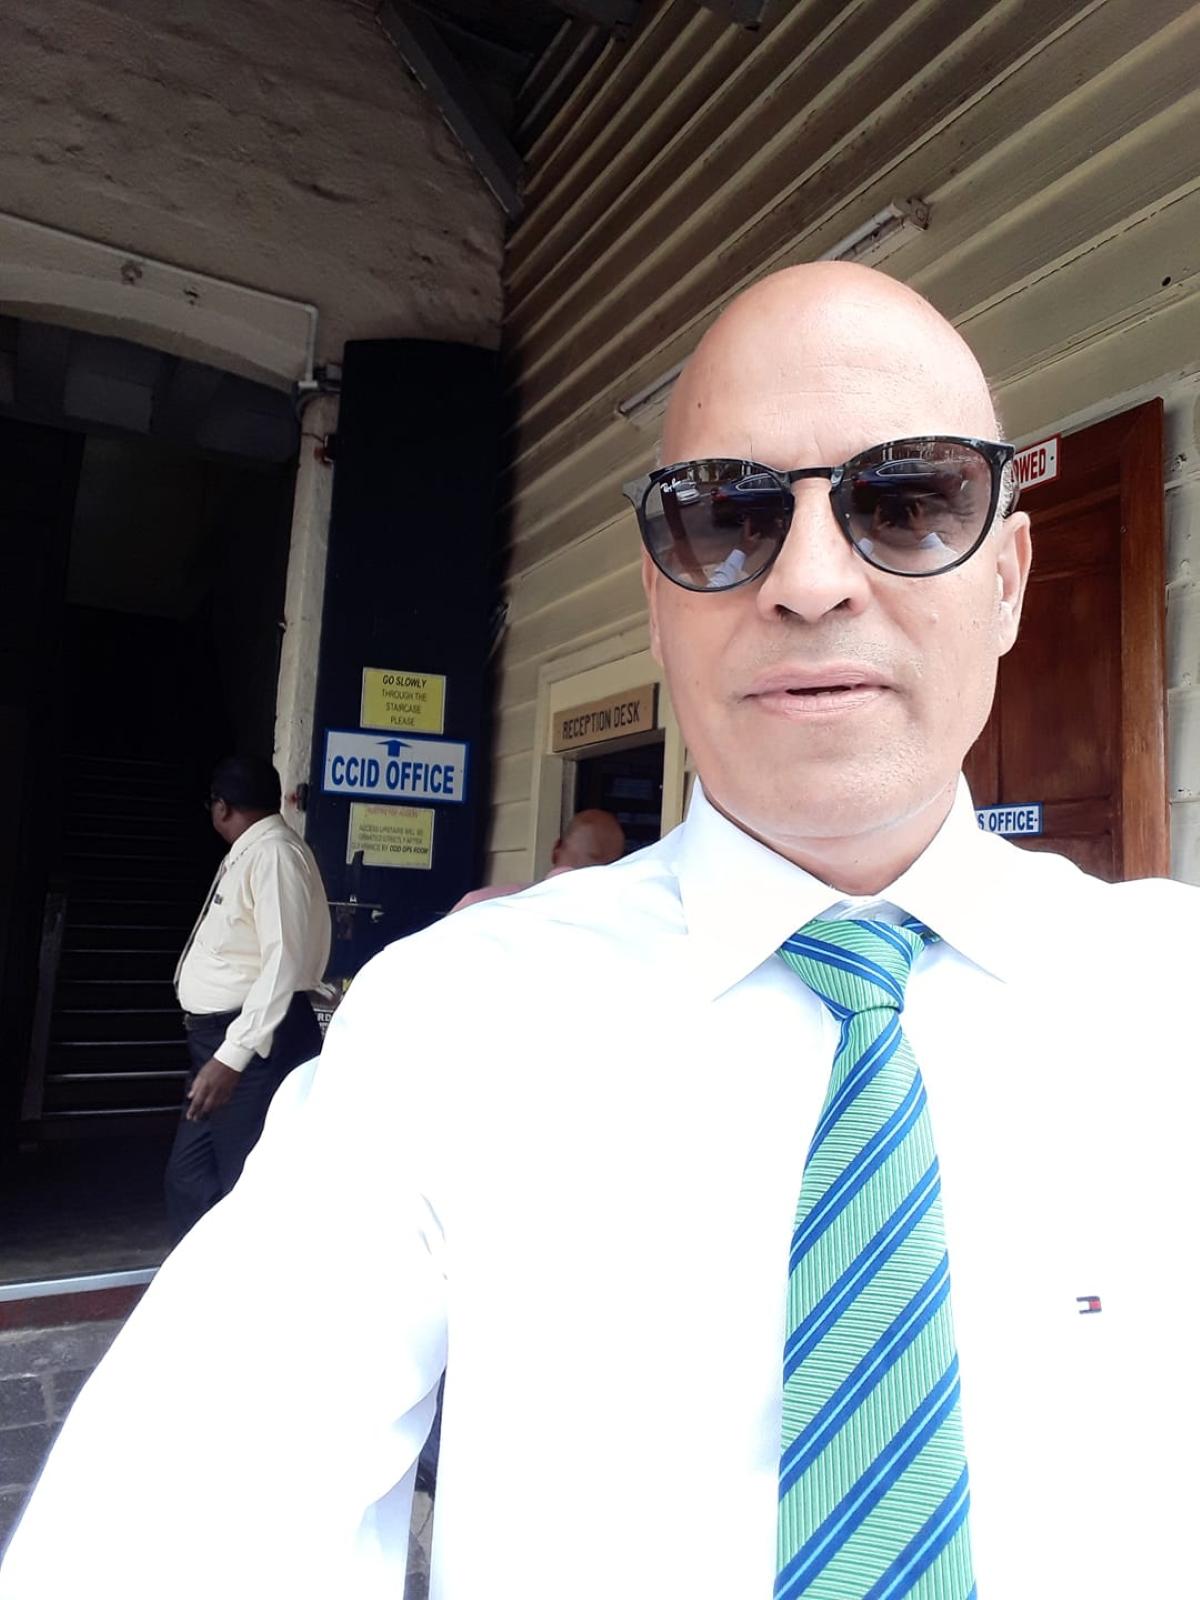 L'ex-journaliste Harish Chundunsing convoqué à la Cybercrime Unit